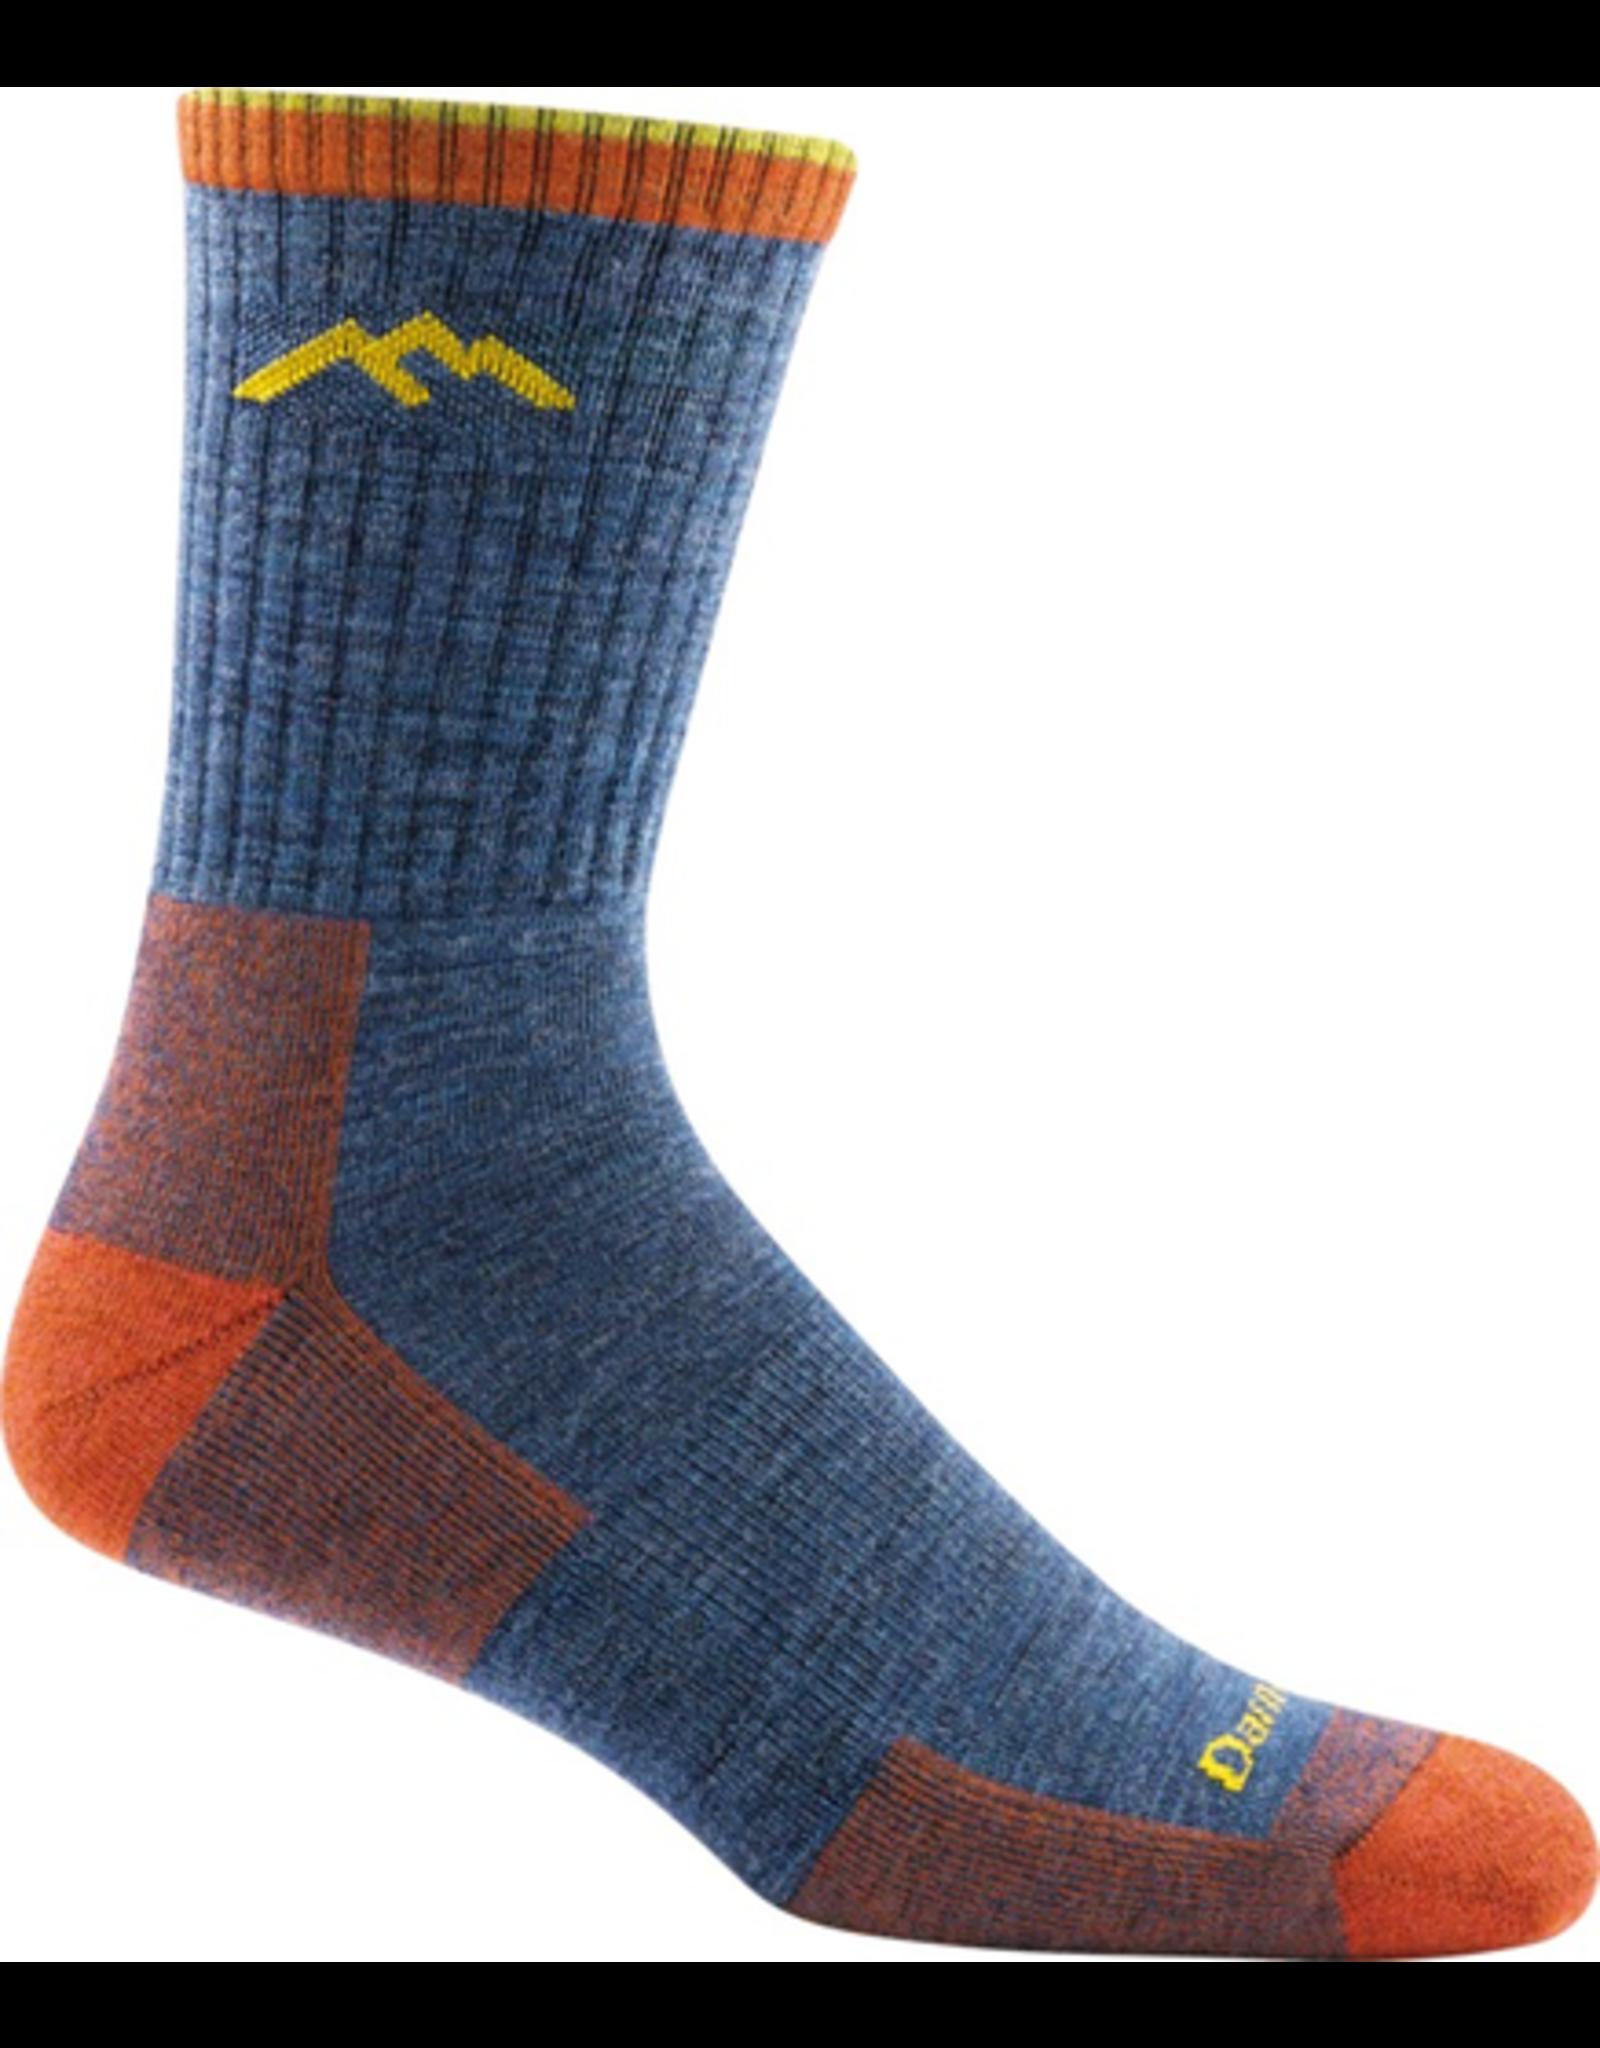 Darn Tough Darn Tough Mens Hike / Trek MICRO CREW CUSHION Sock